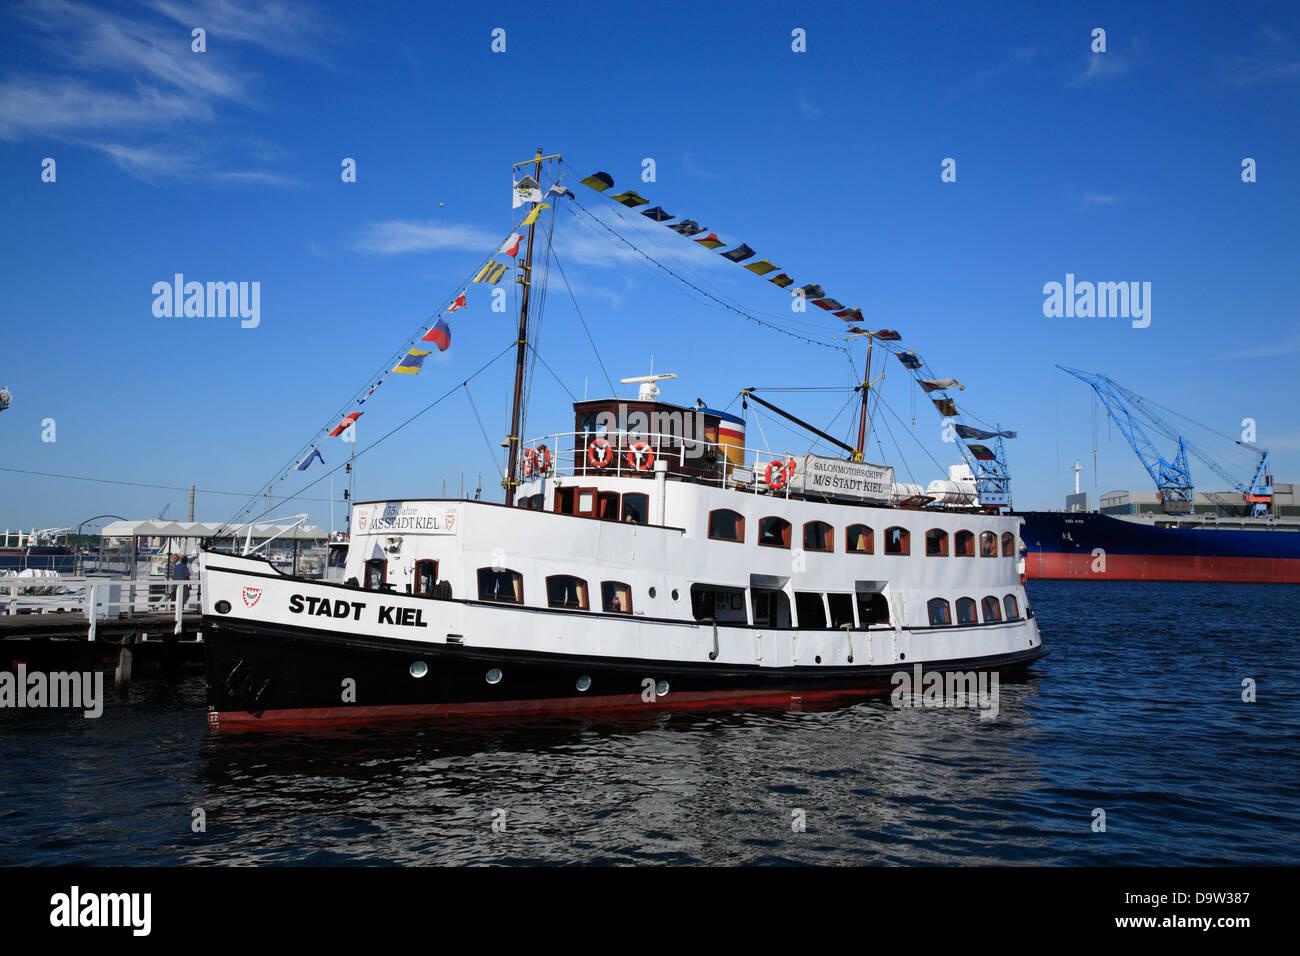 Ferry at Kiel harbor, Schleswig-Holstein, Germany, Europe - Stock Image